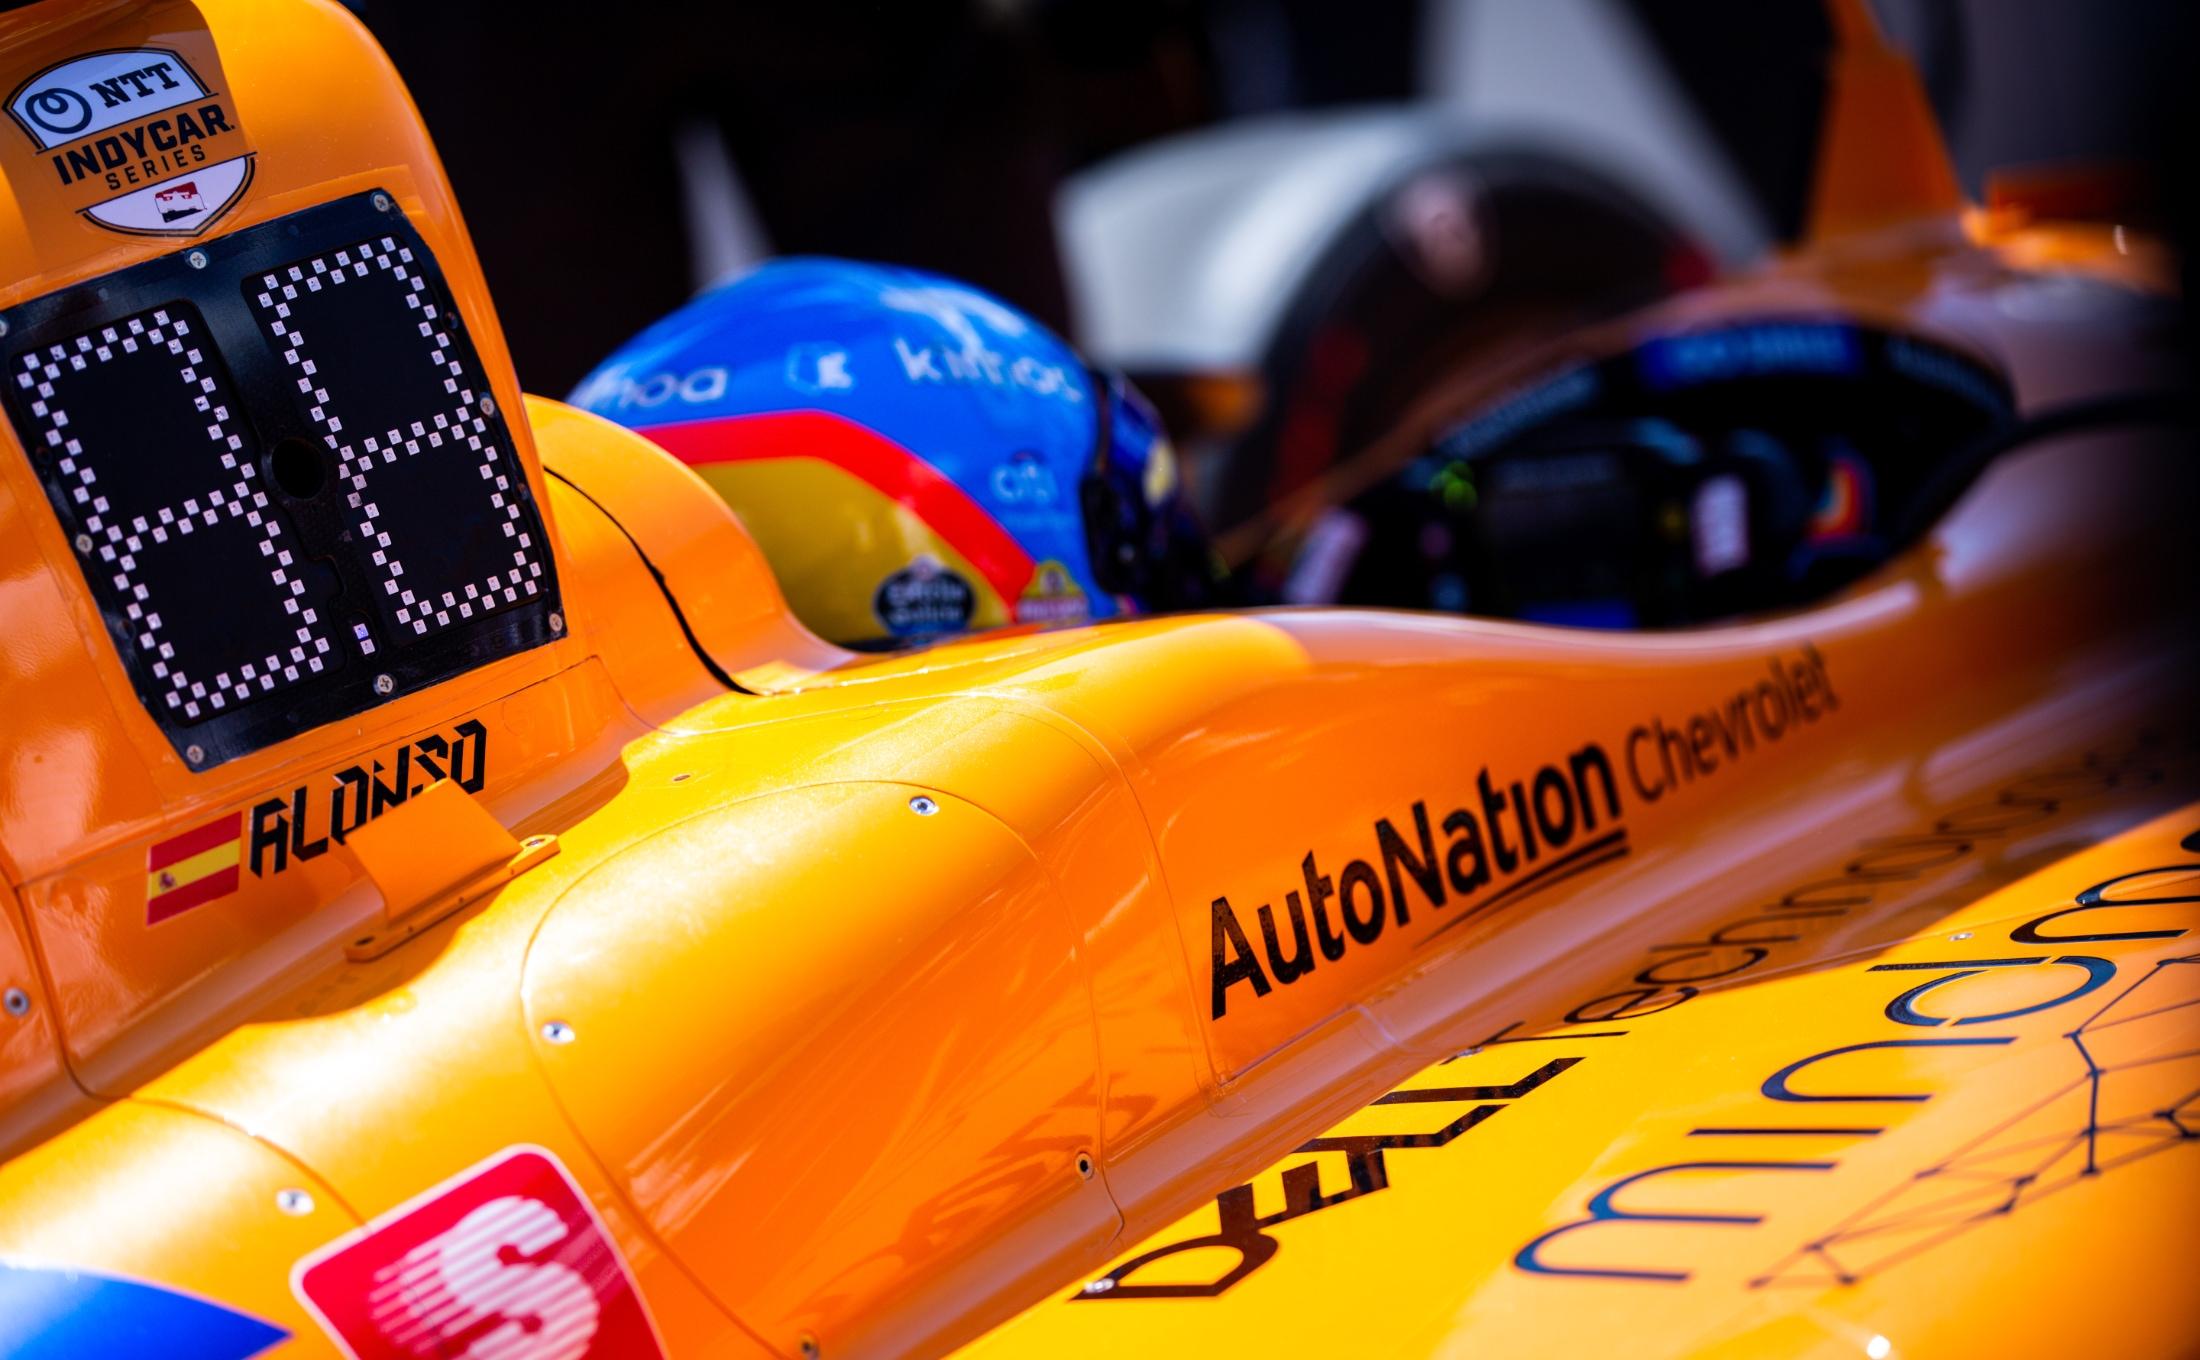 Sponsor partners on McLaren 2019 Indy 500 race car